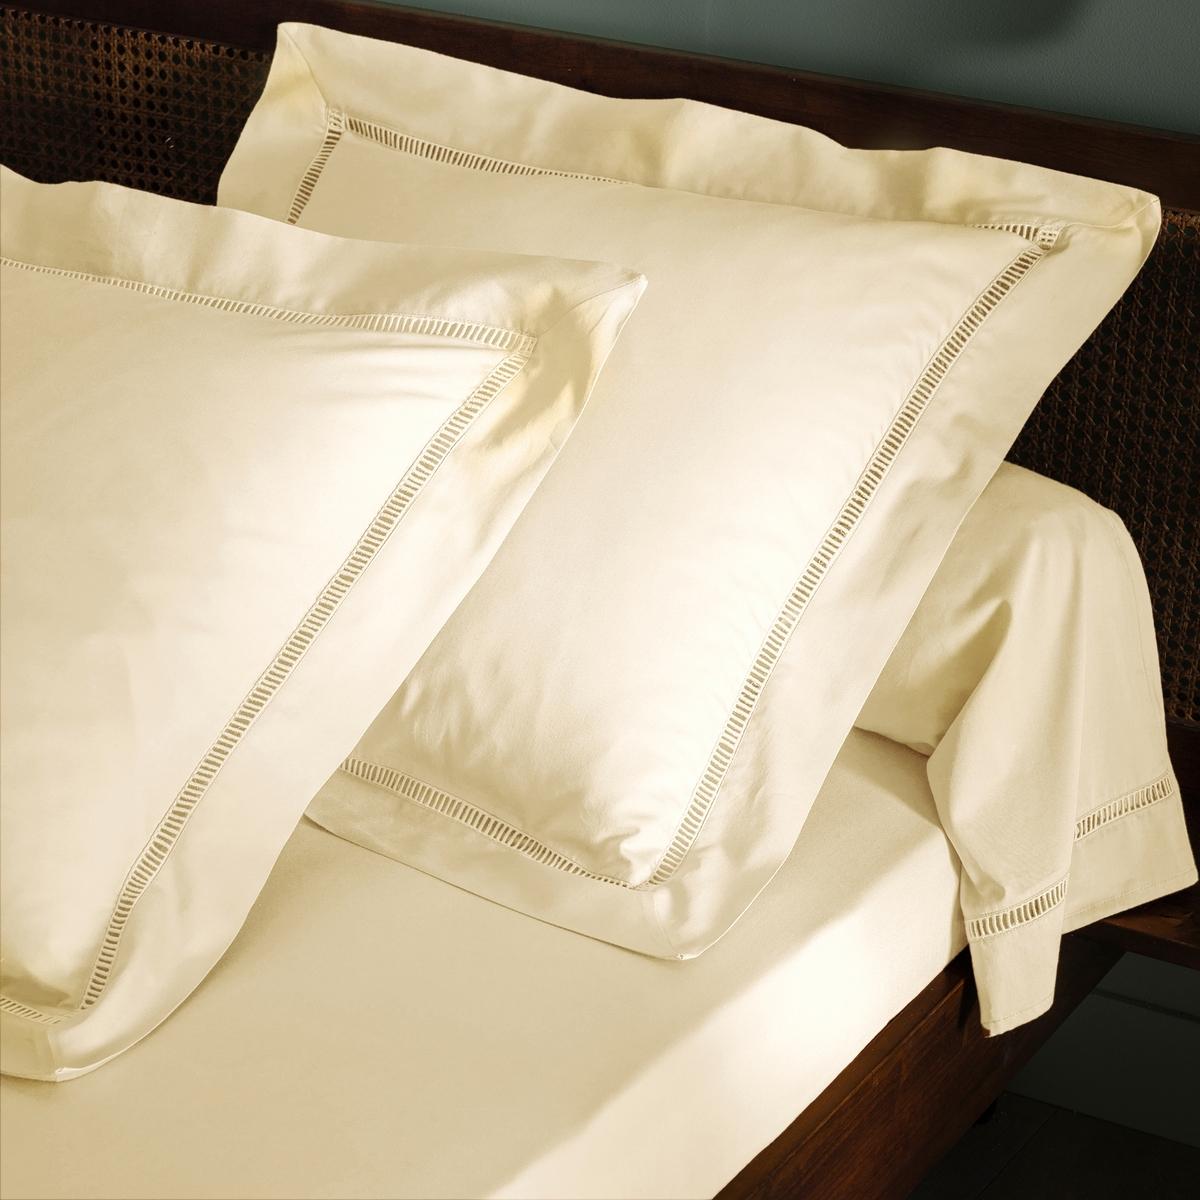 Наволочка стандартная или на подушку-валик, из 100% хлопкового сатина, Constance